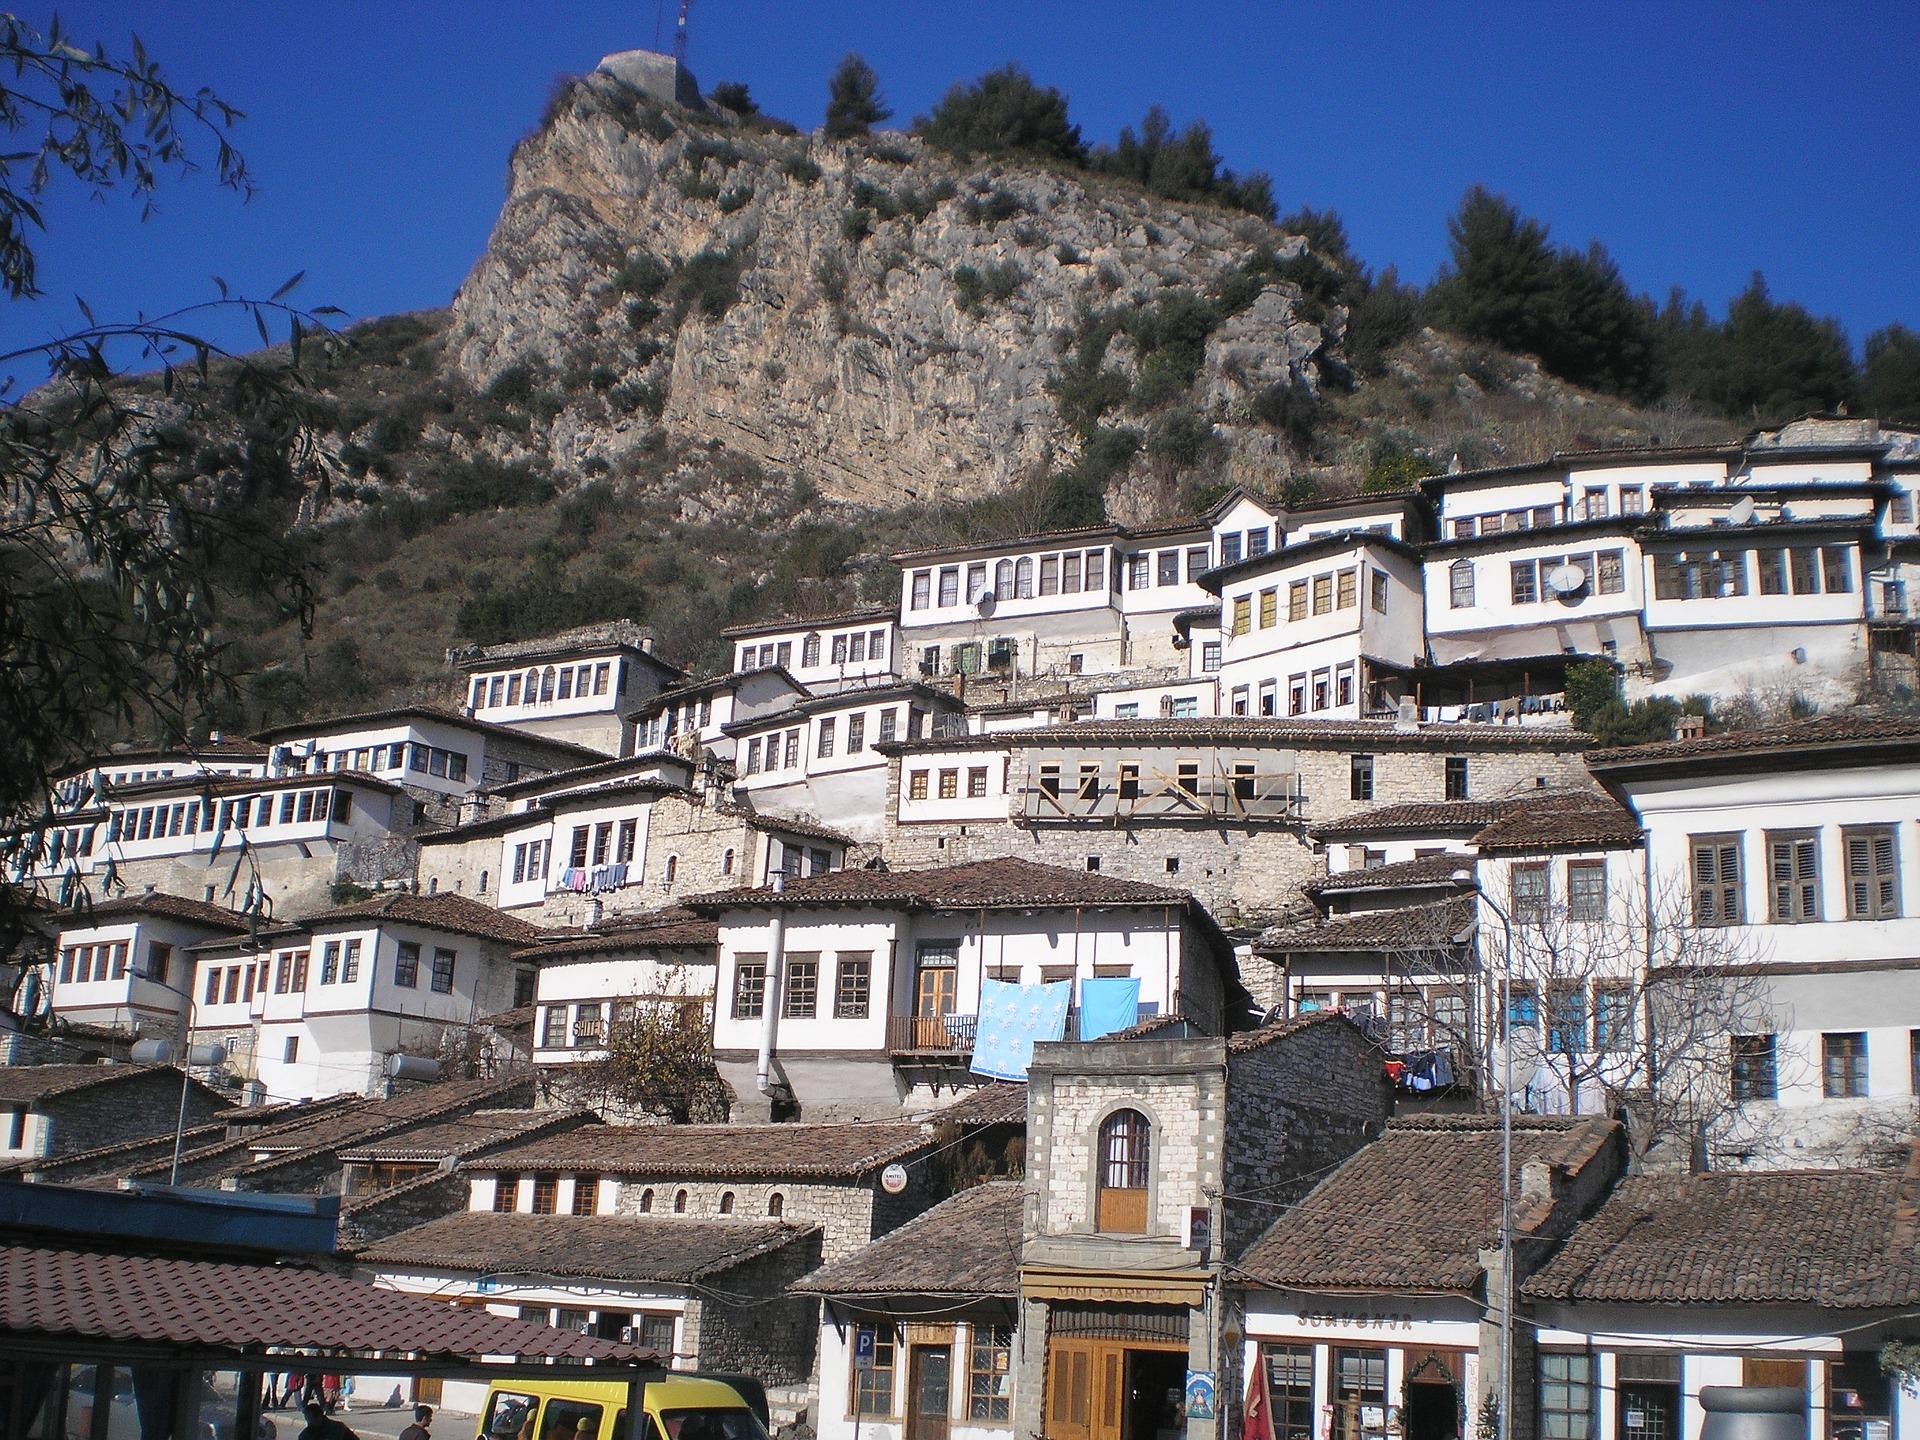 visit Berat from Tirana as a day trip.